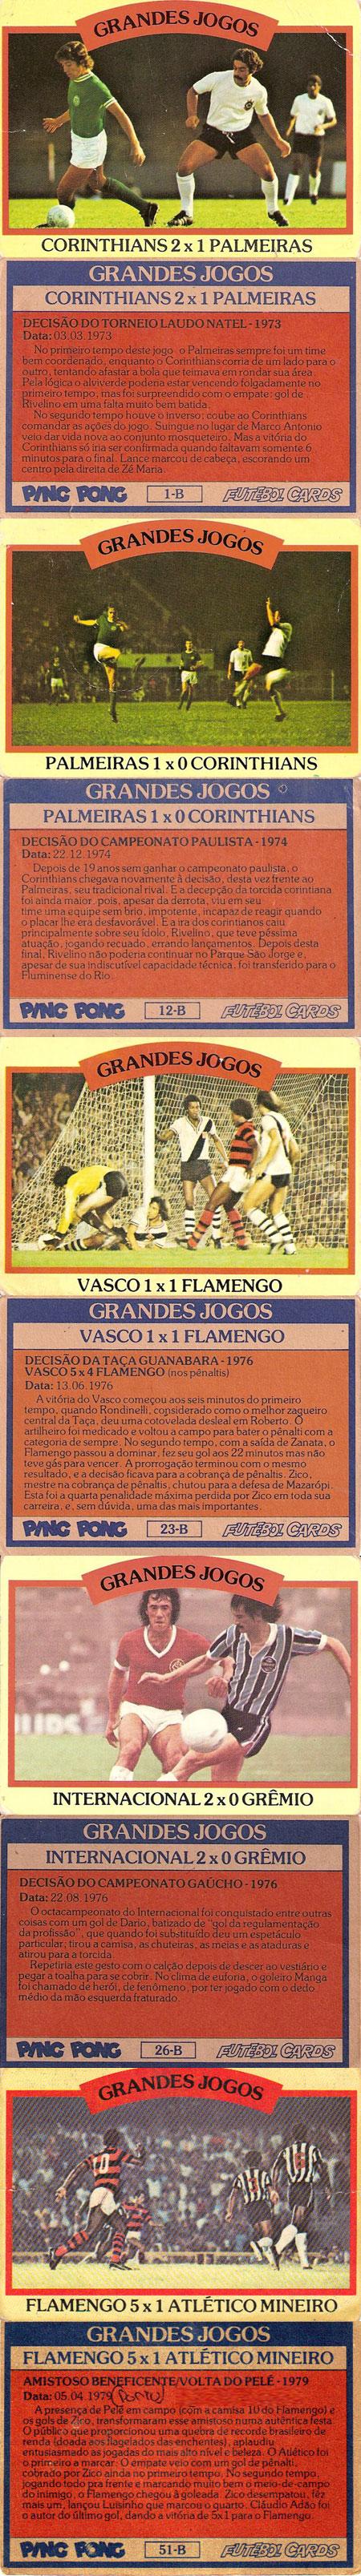 futebol_cards.jpg